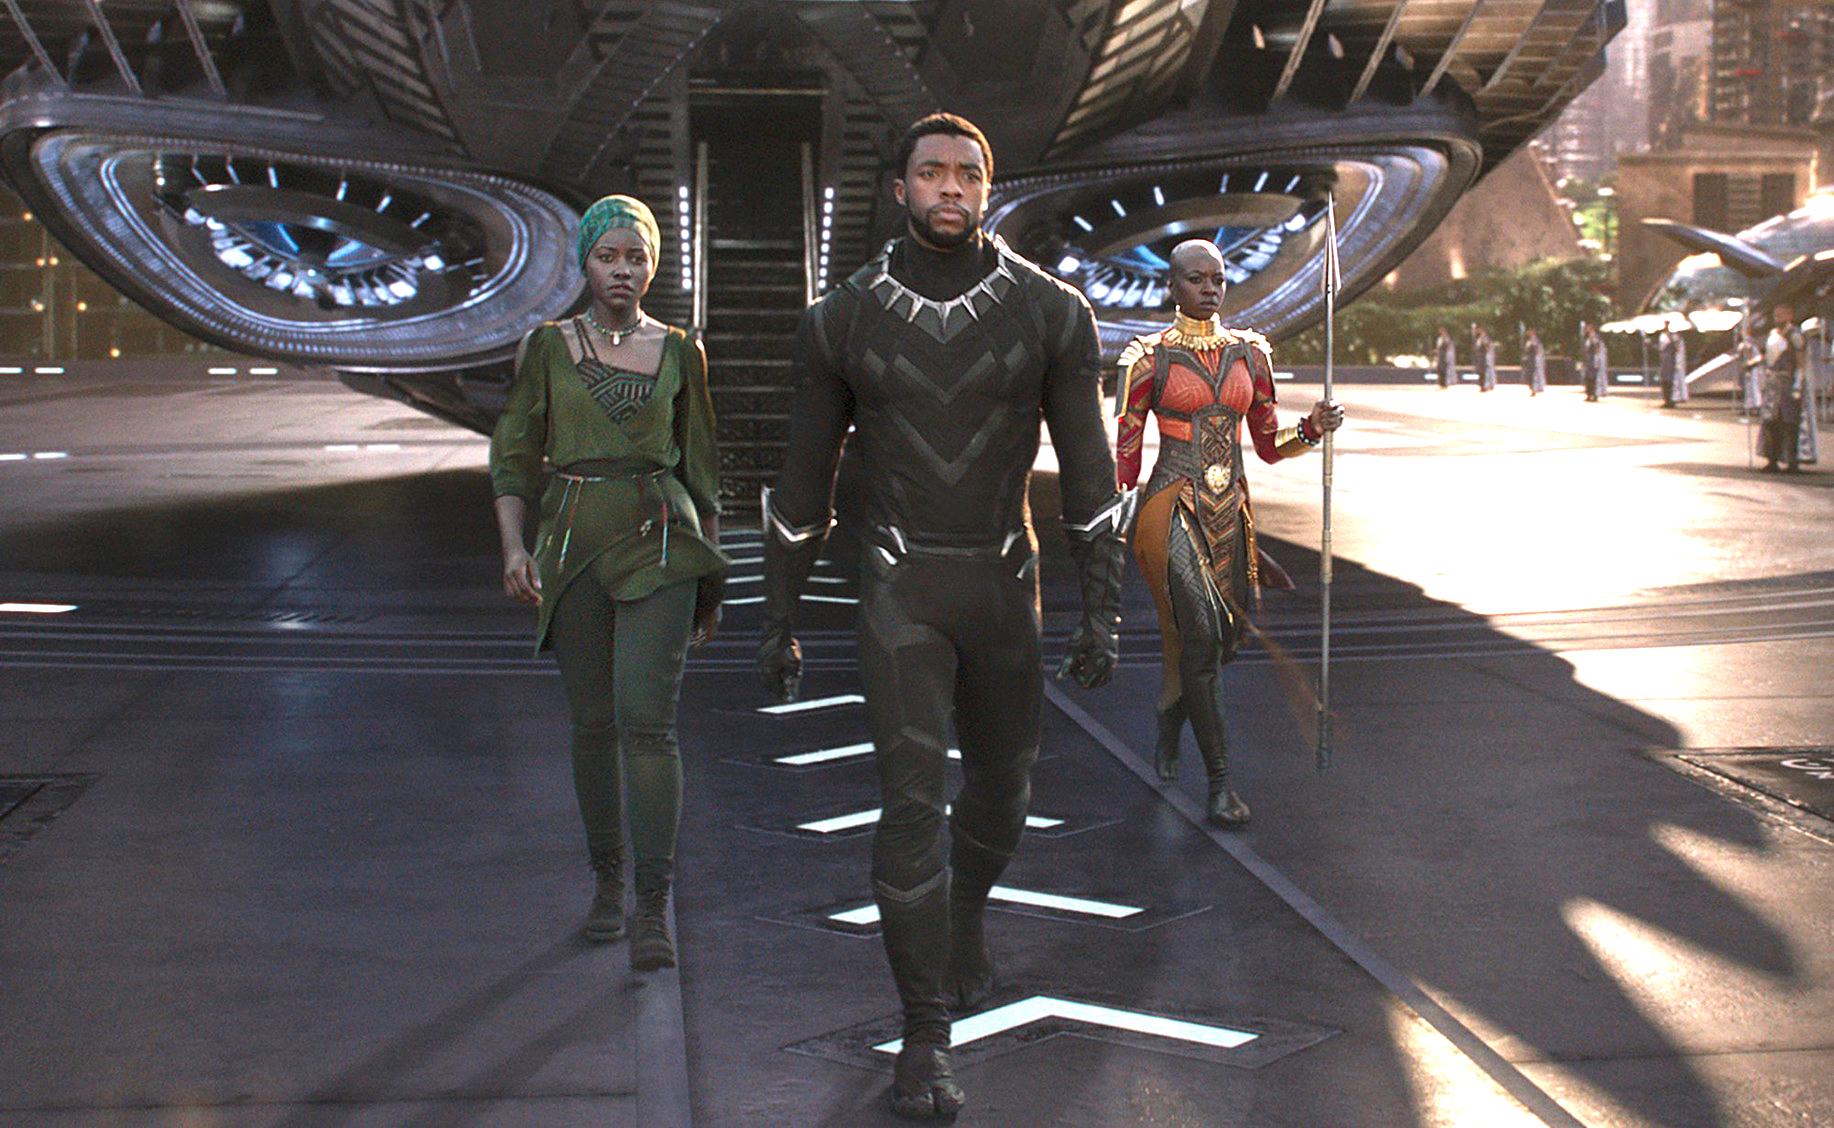 V Africe se probouzí k životu Wakanda s technologiemi budoucnosti